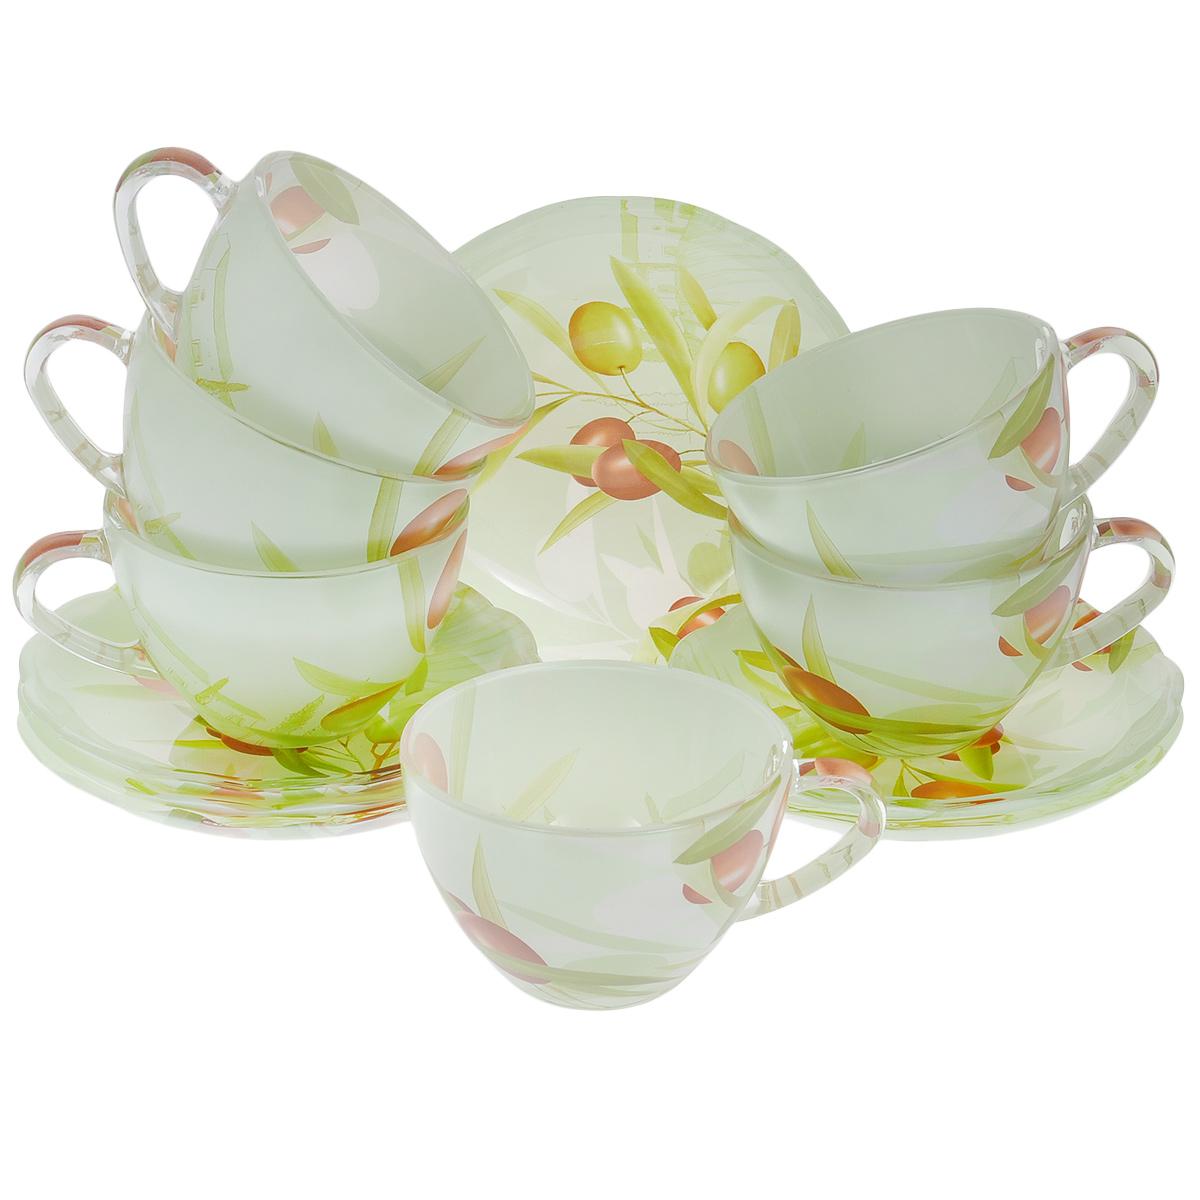 Набор посуды Оливки, 12 предметов